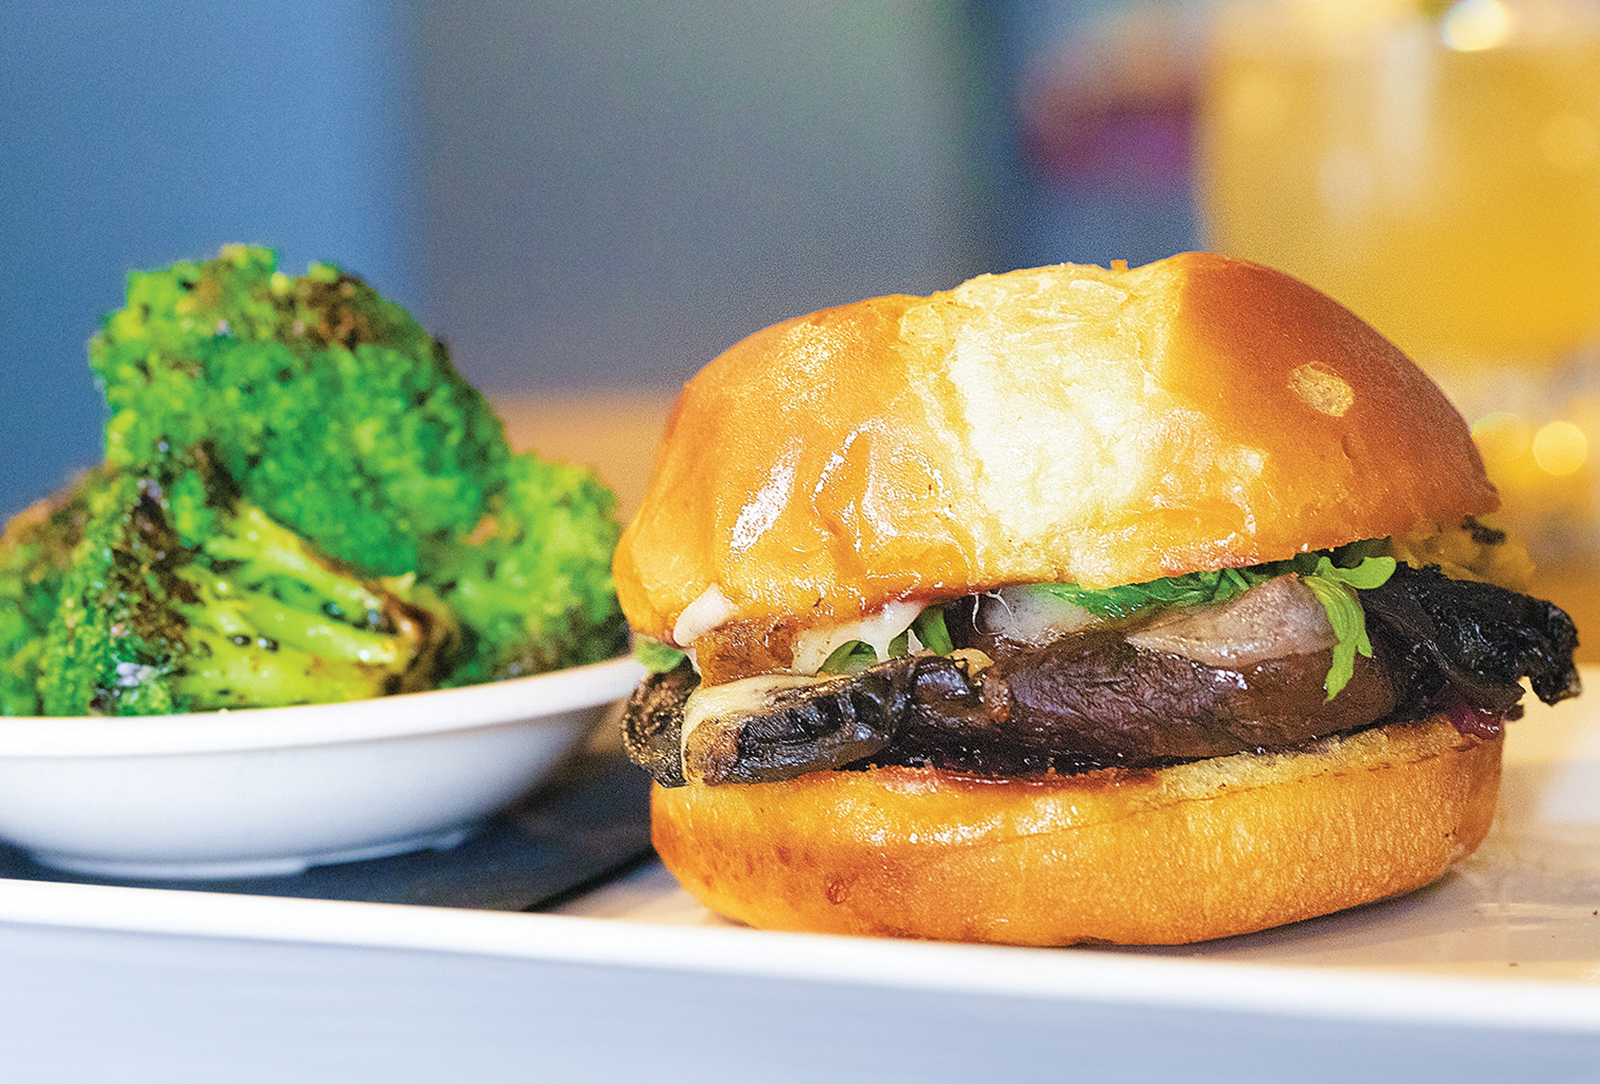 highlands-nc-4118-kitchen-and-bar-sandwich